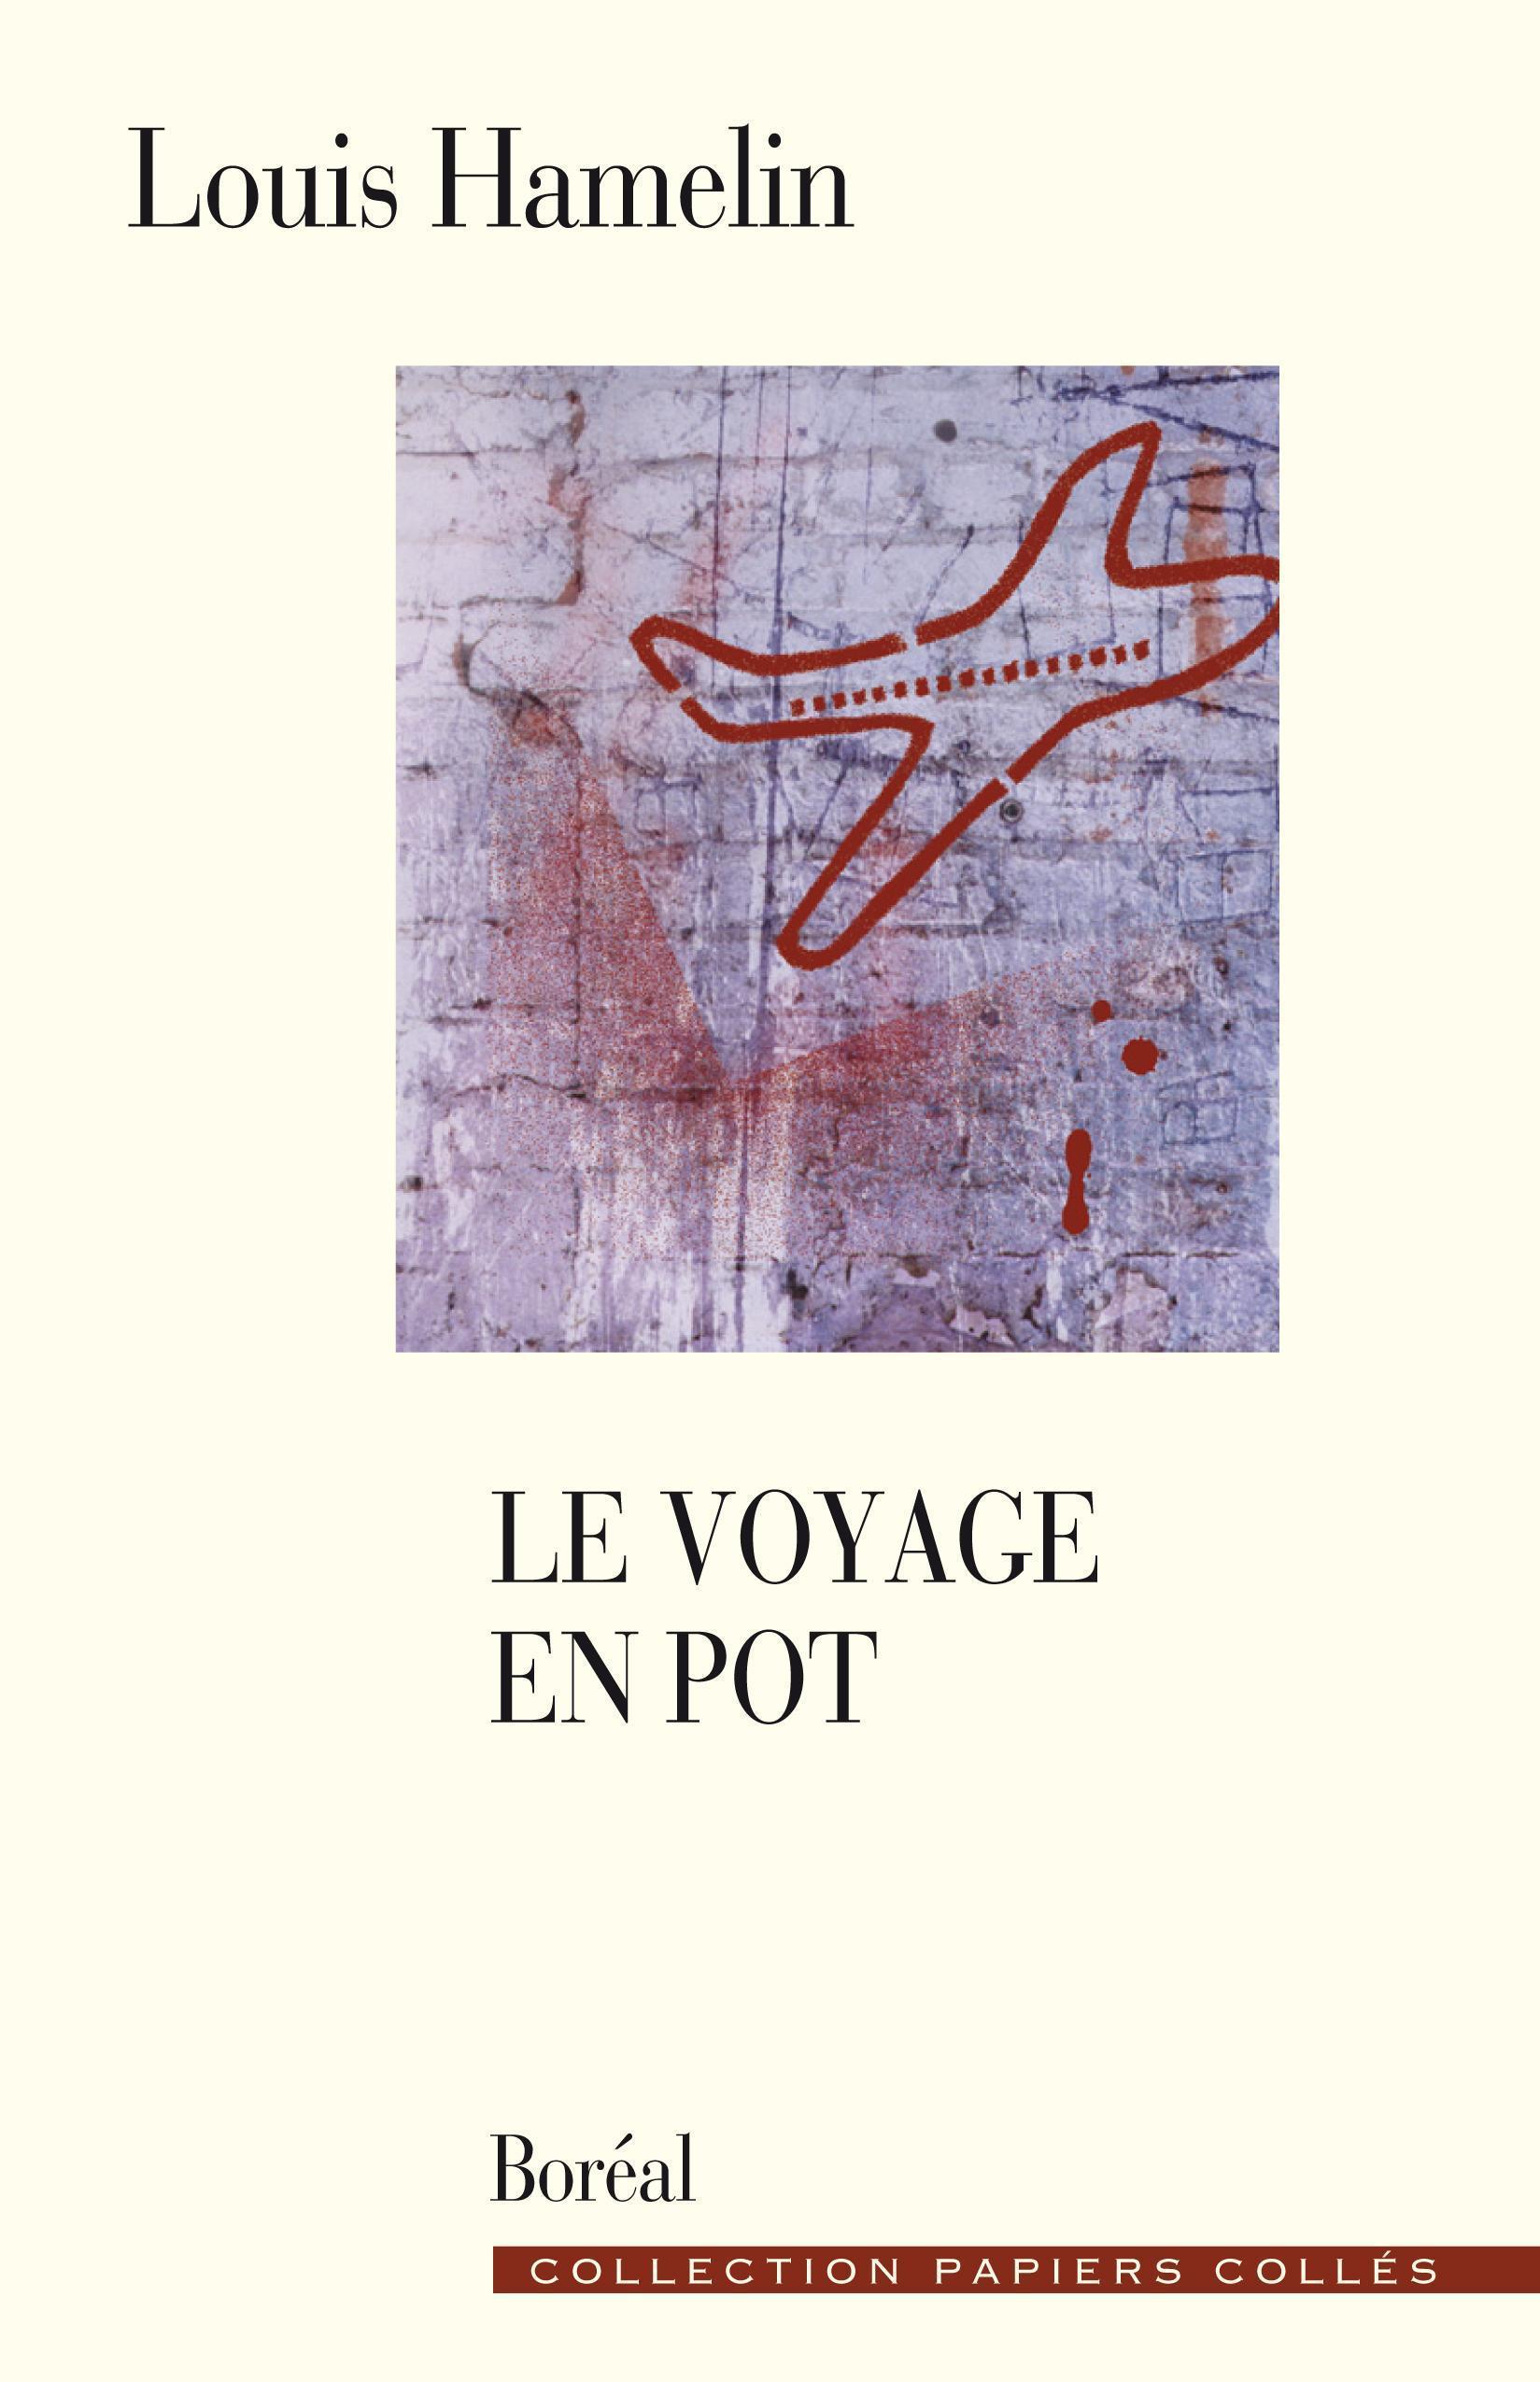 Le Voyage en pot